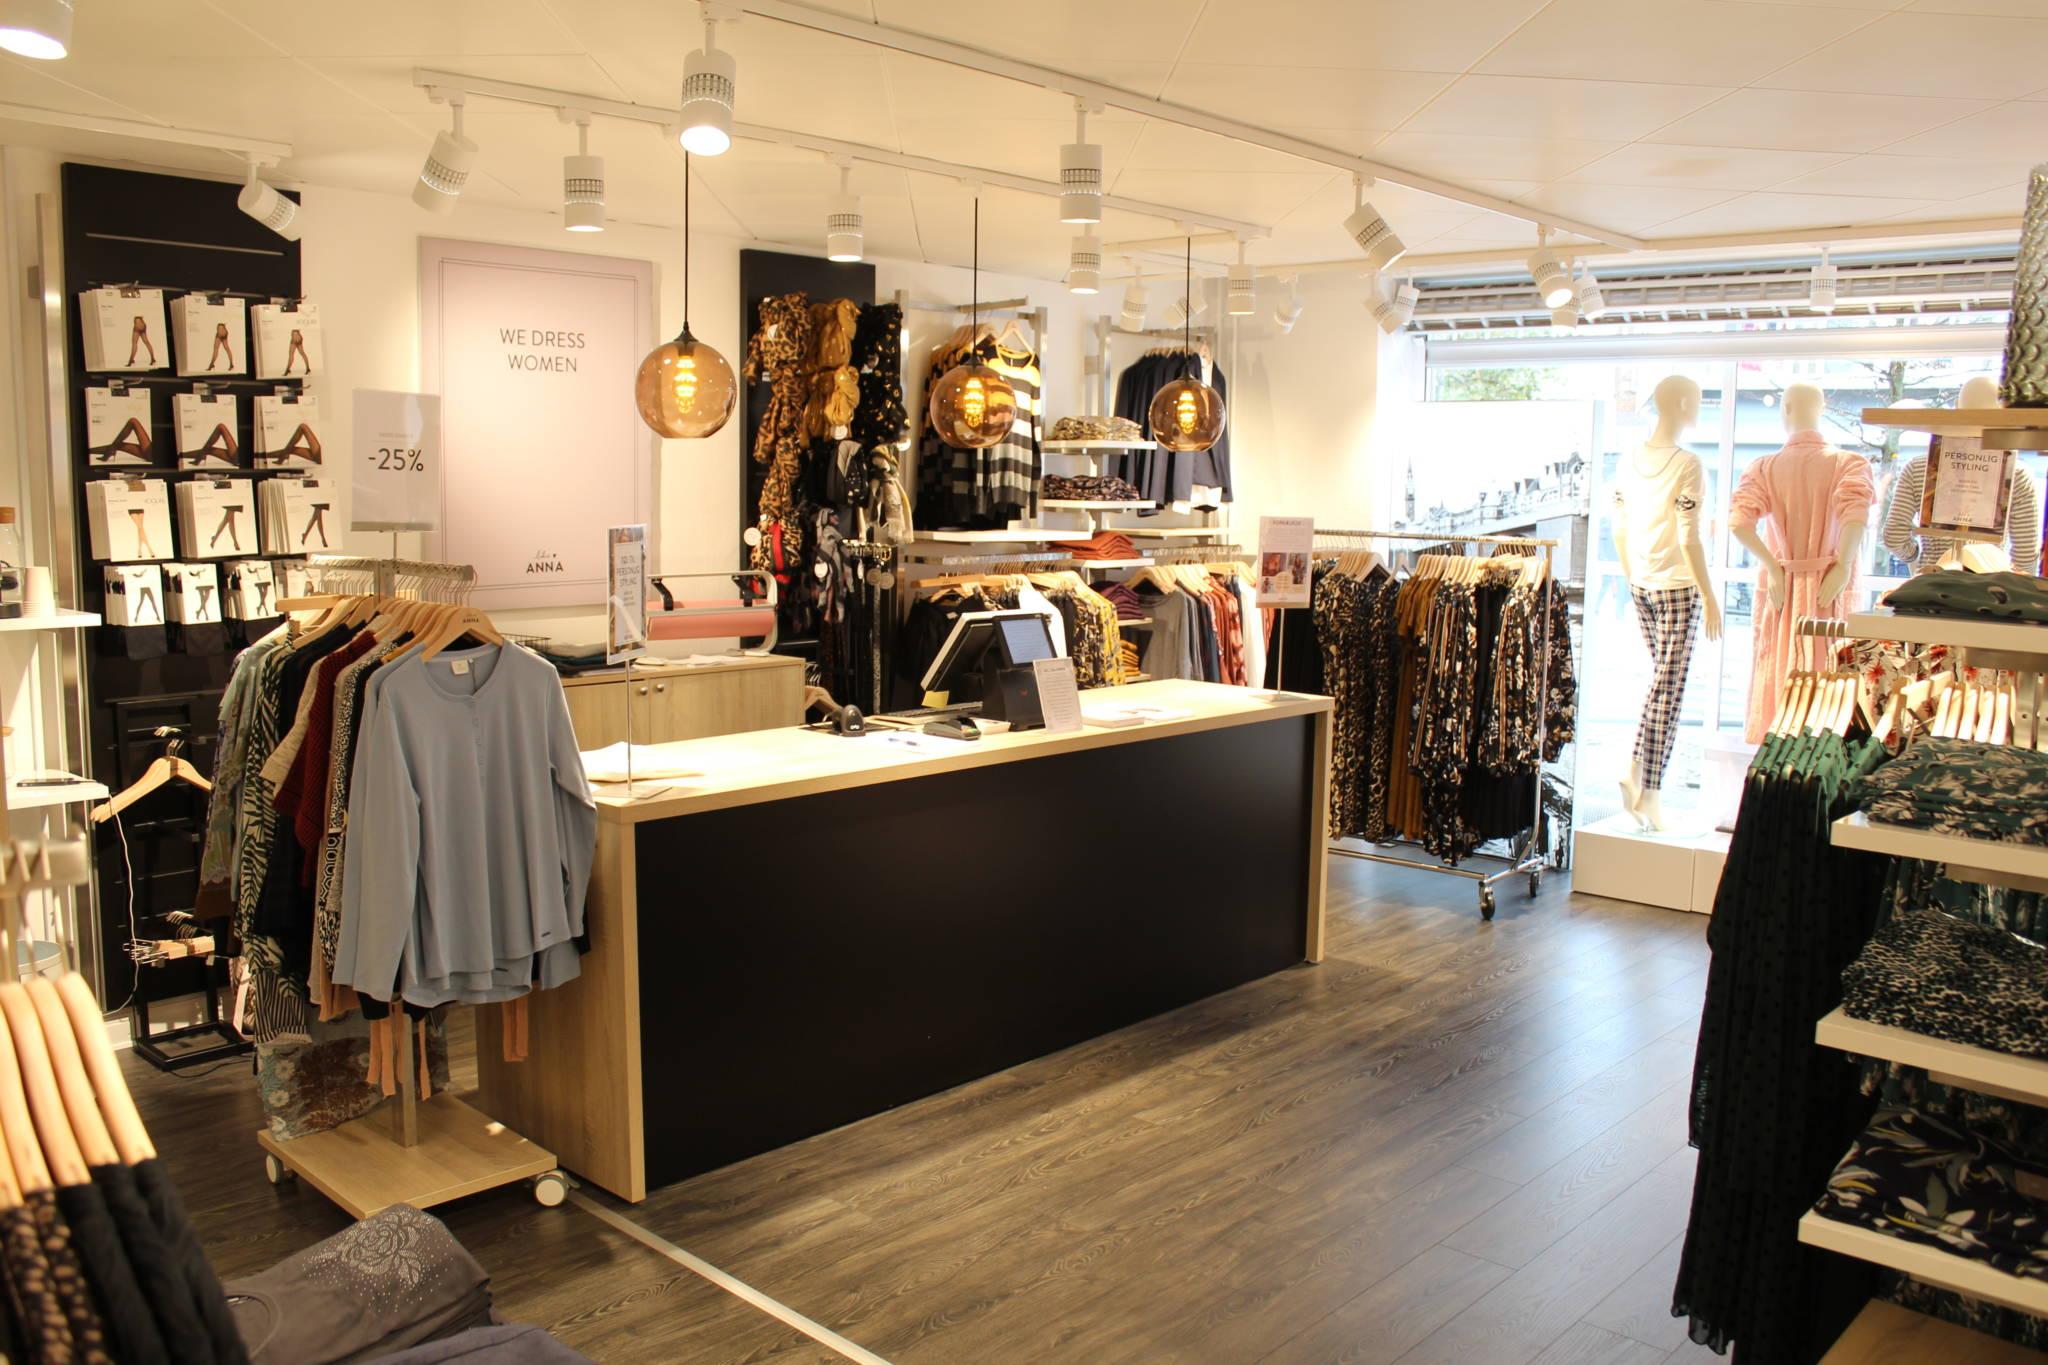 Flot butiksdisk i egetræ og sort. Butiksindretning og butiksinventar.